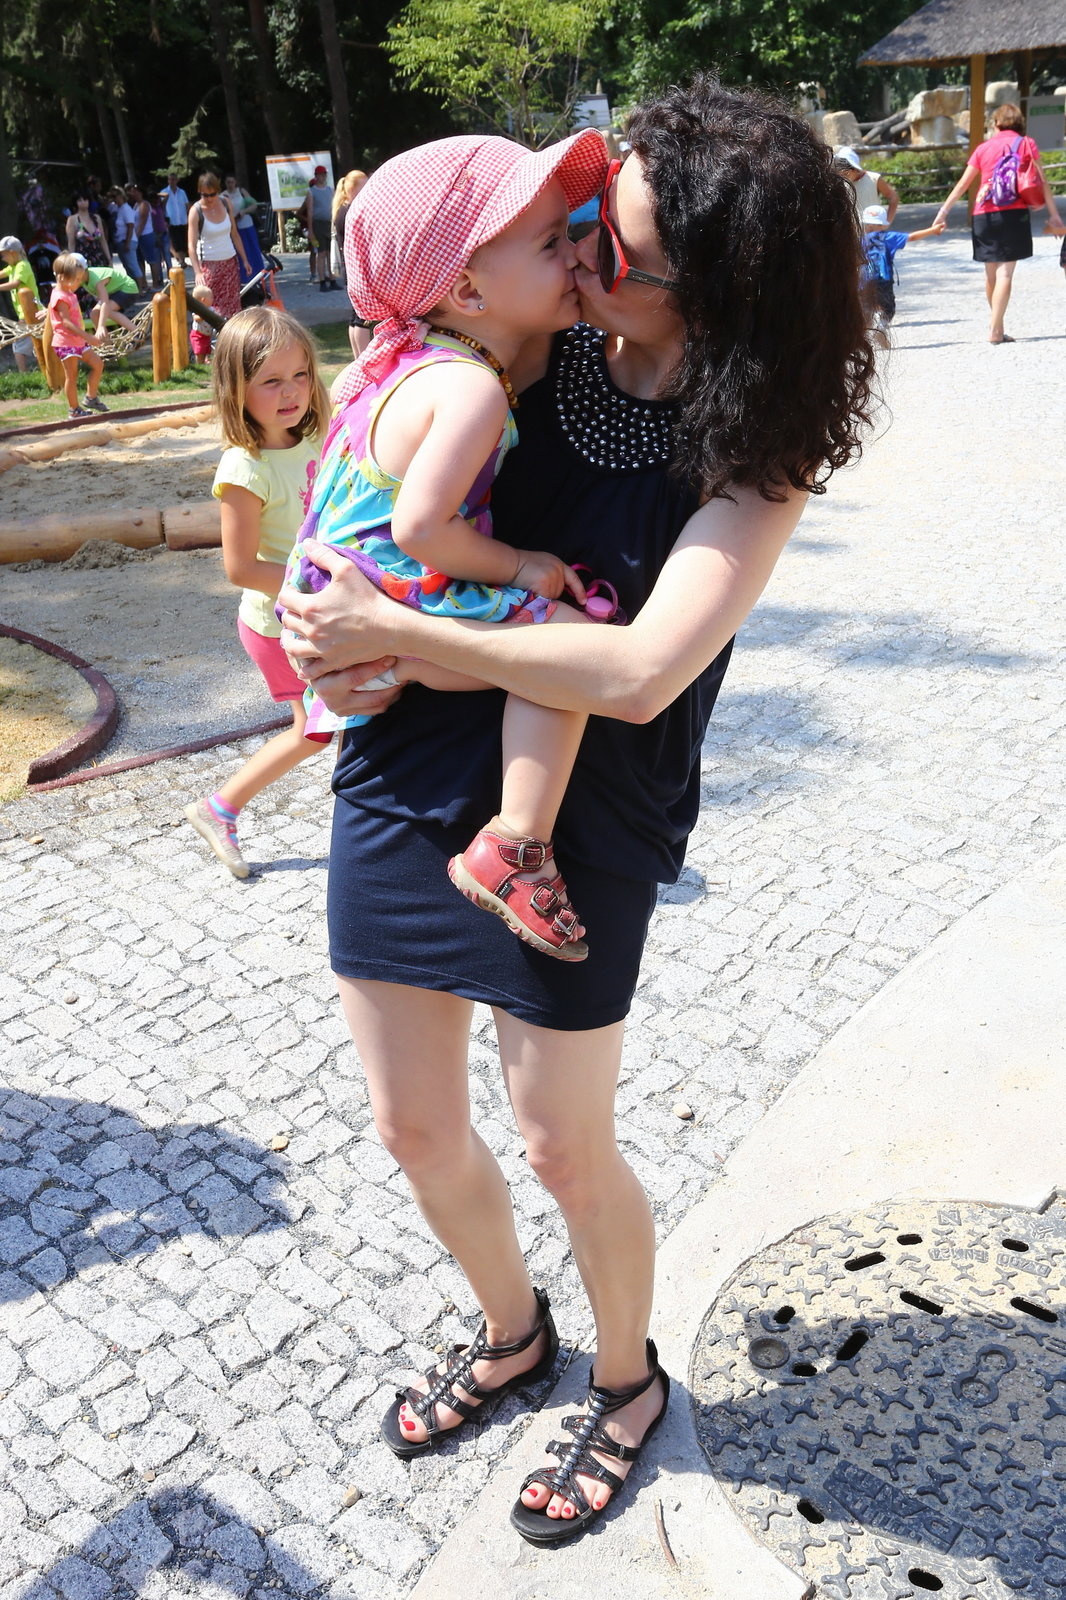 Maminka Lucie Šoralová je ze své holčičky nadšená.